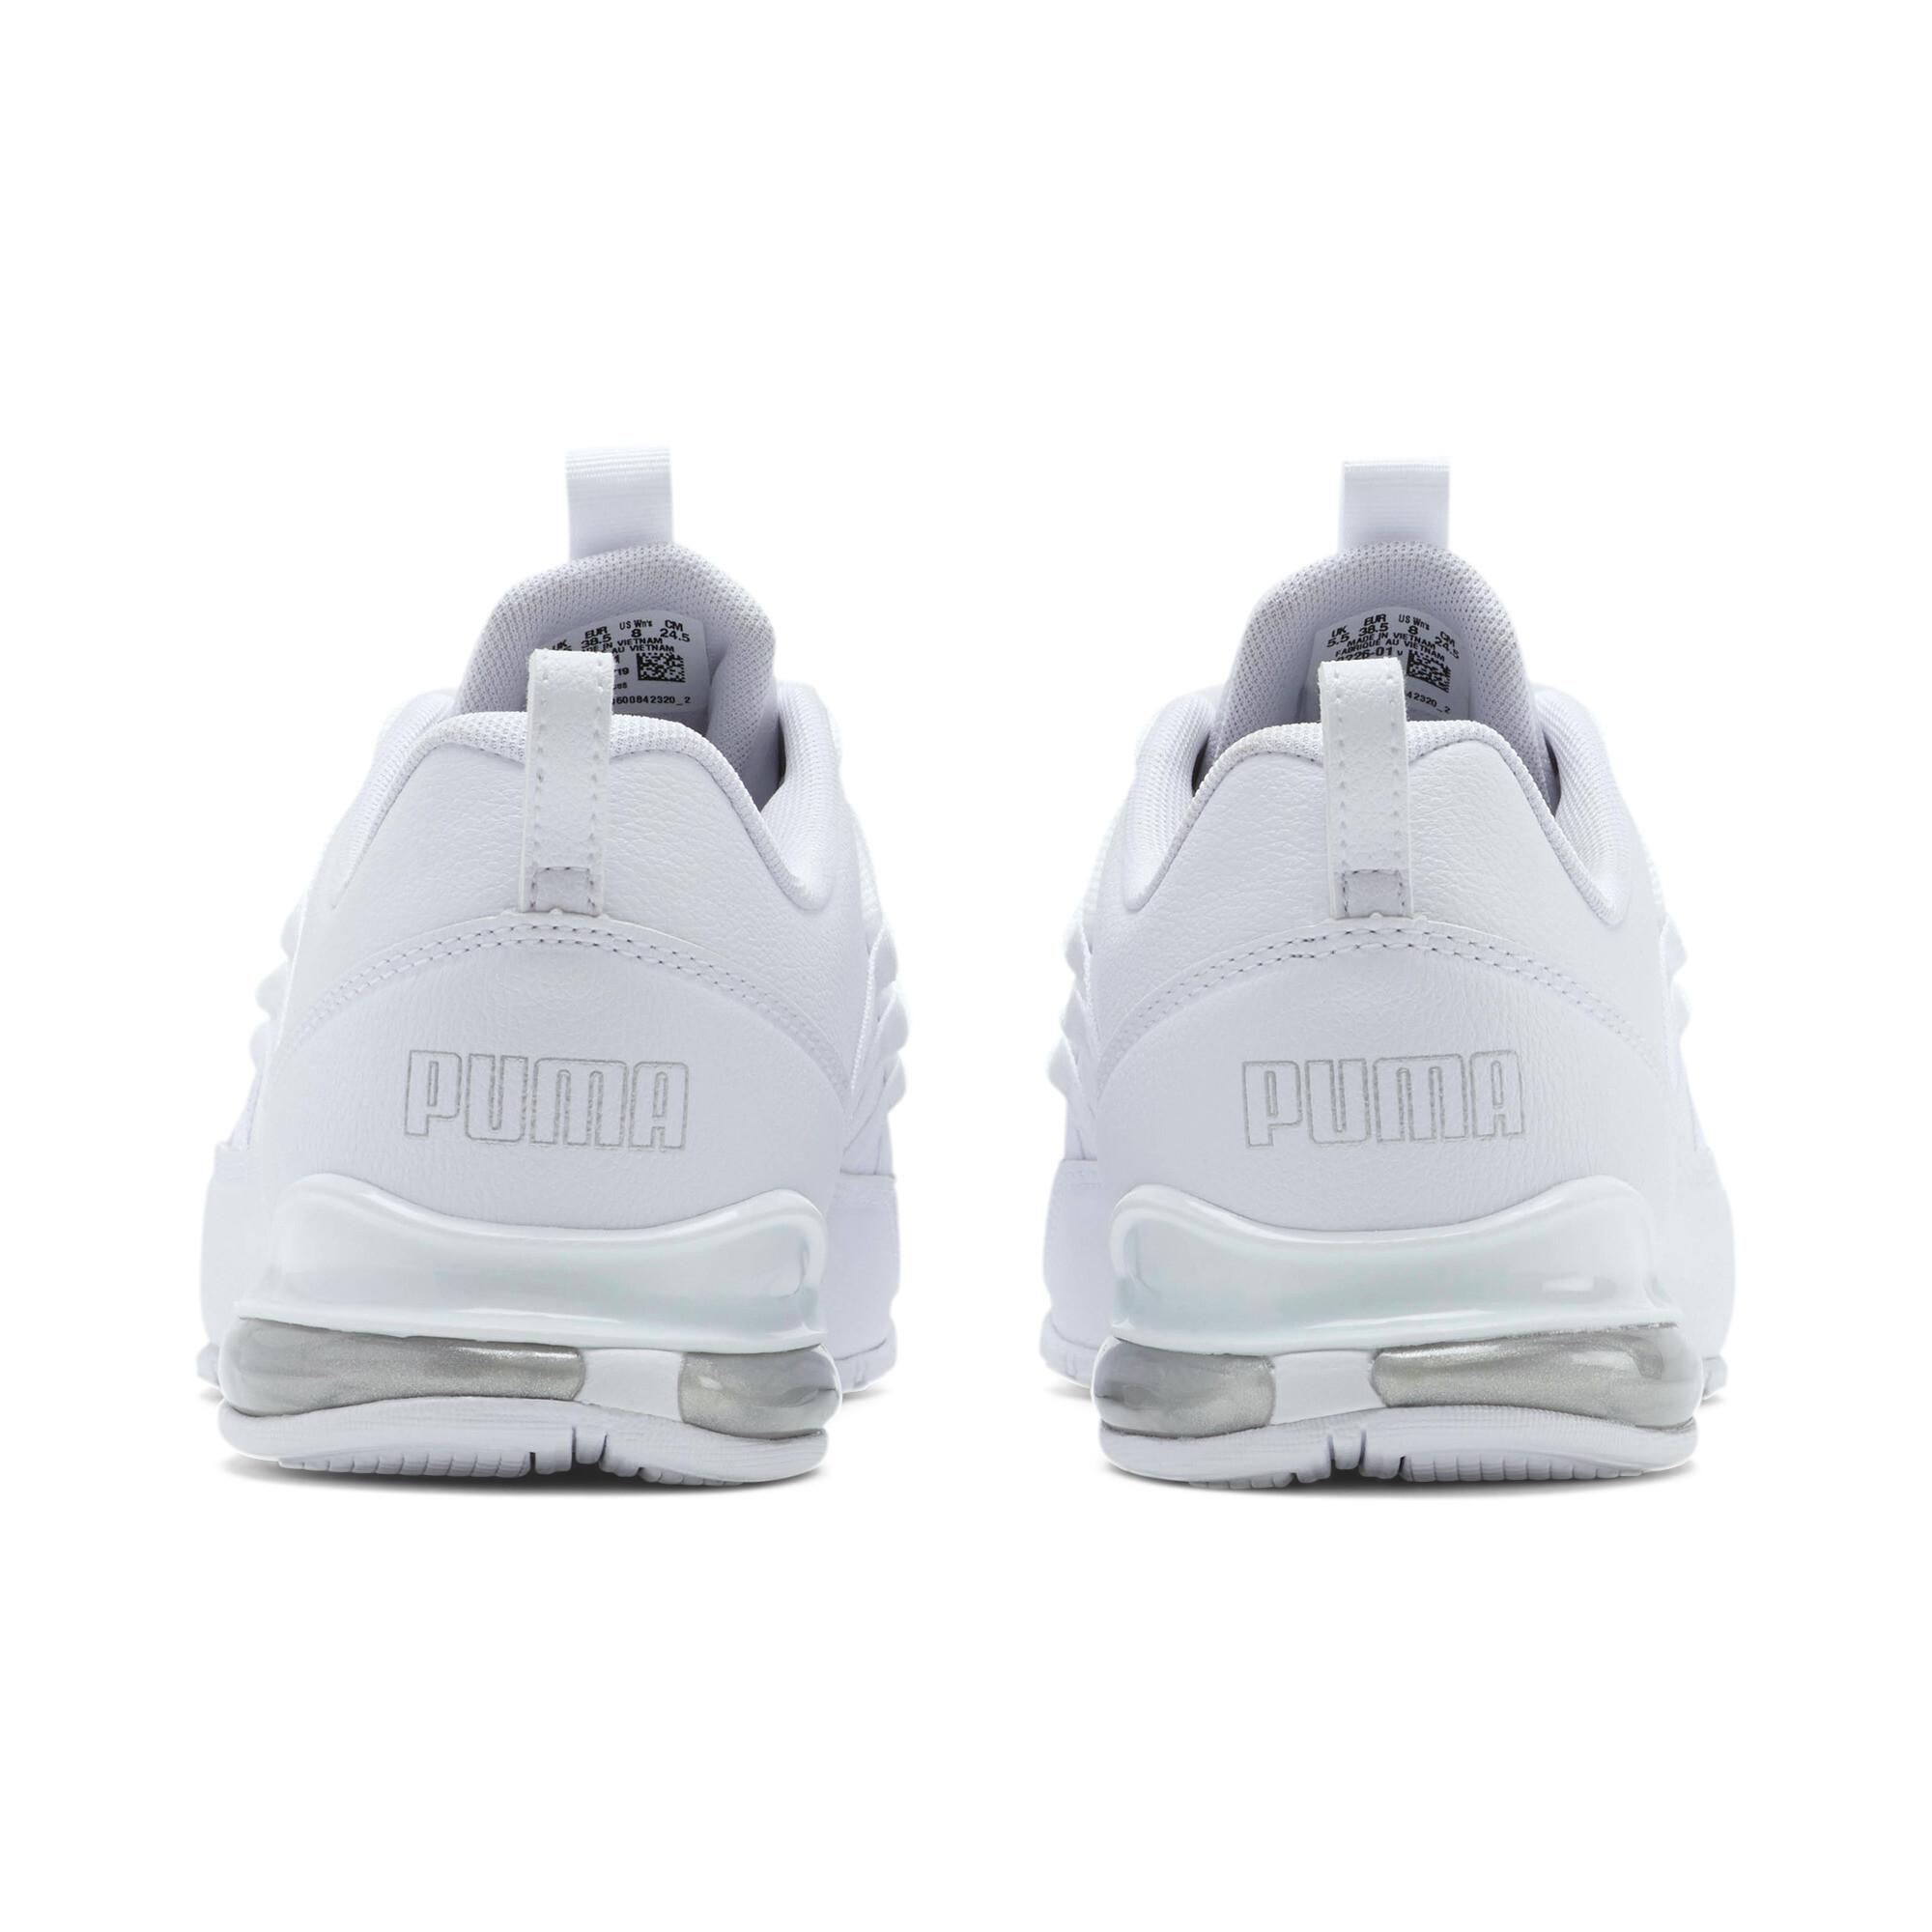 PUMA-Women-039-s-Riaze-Prowl-Wide-Sneakers thumbnail 3